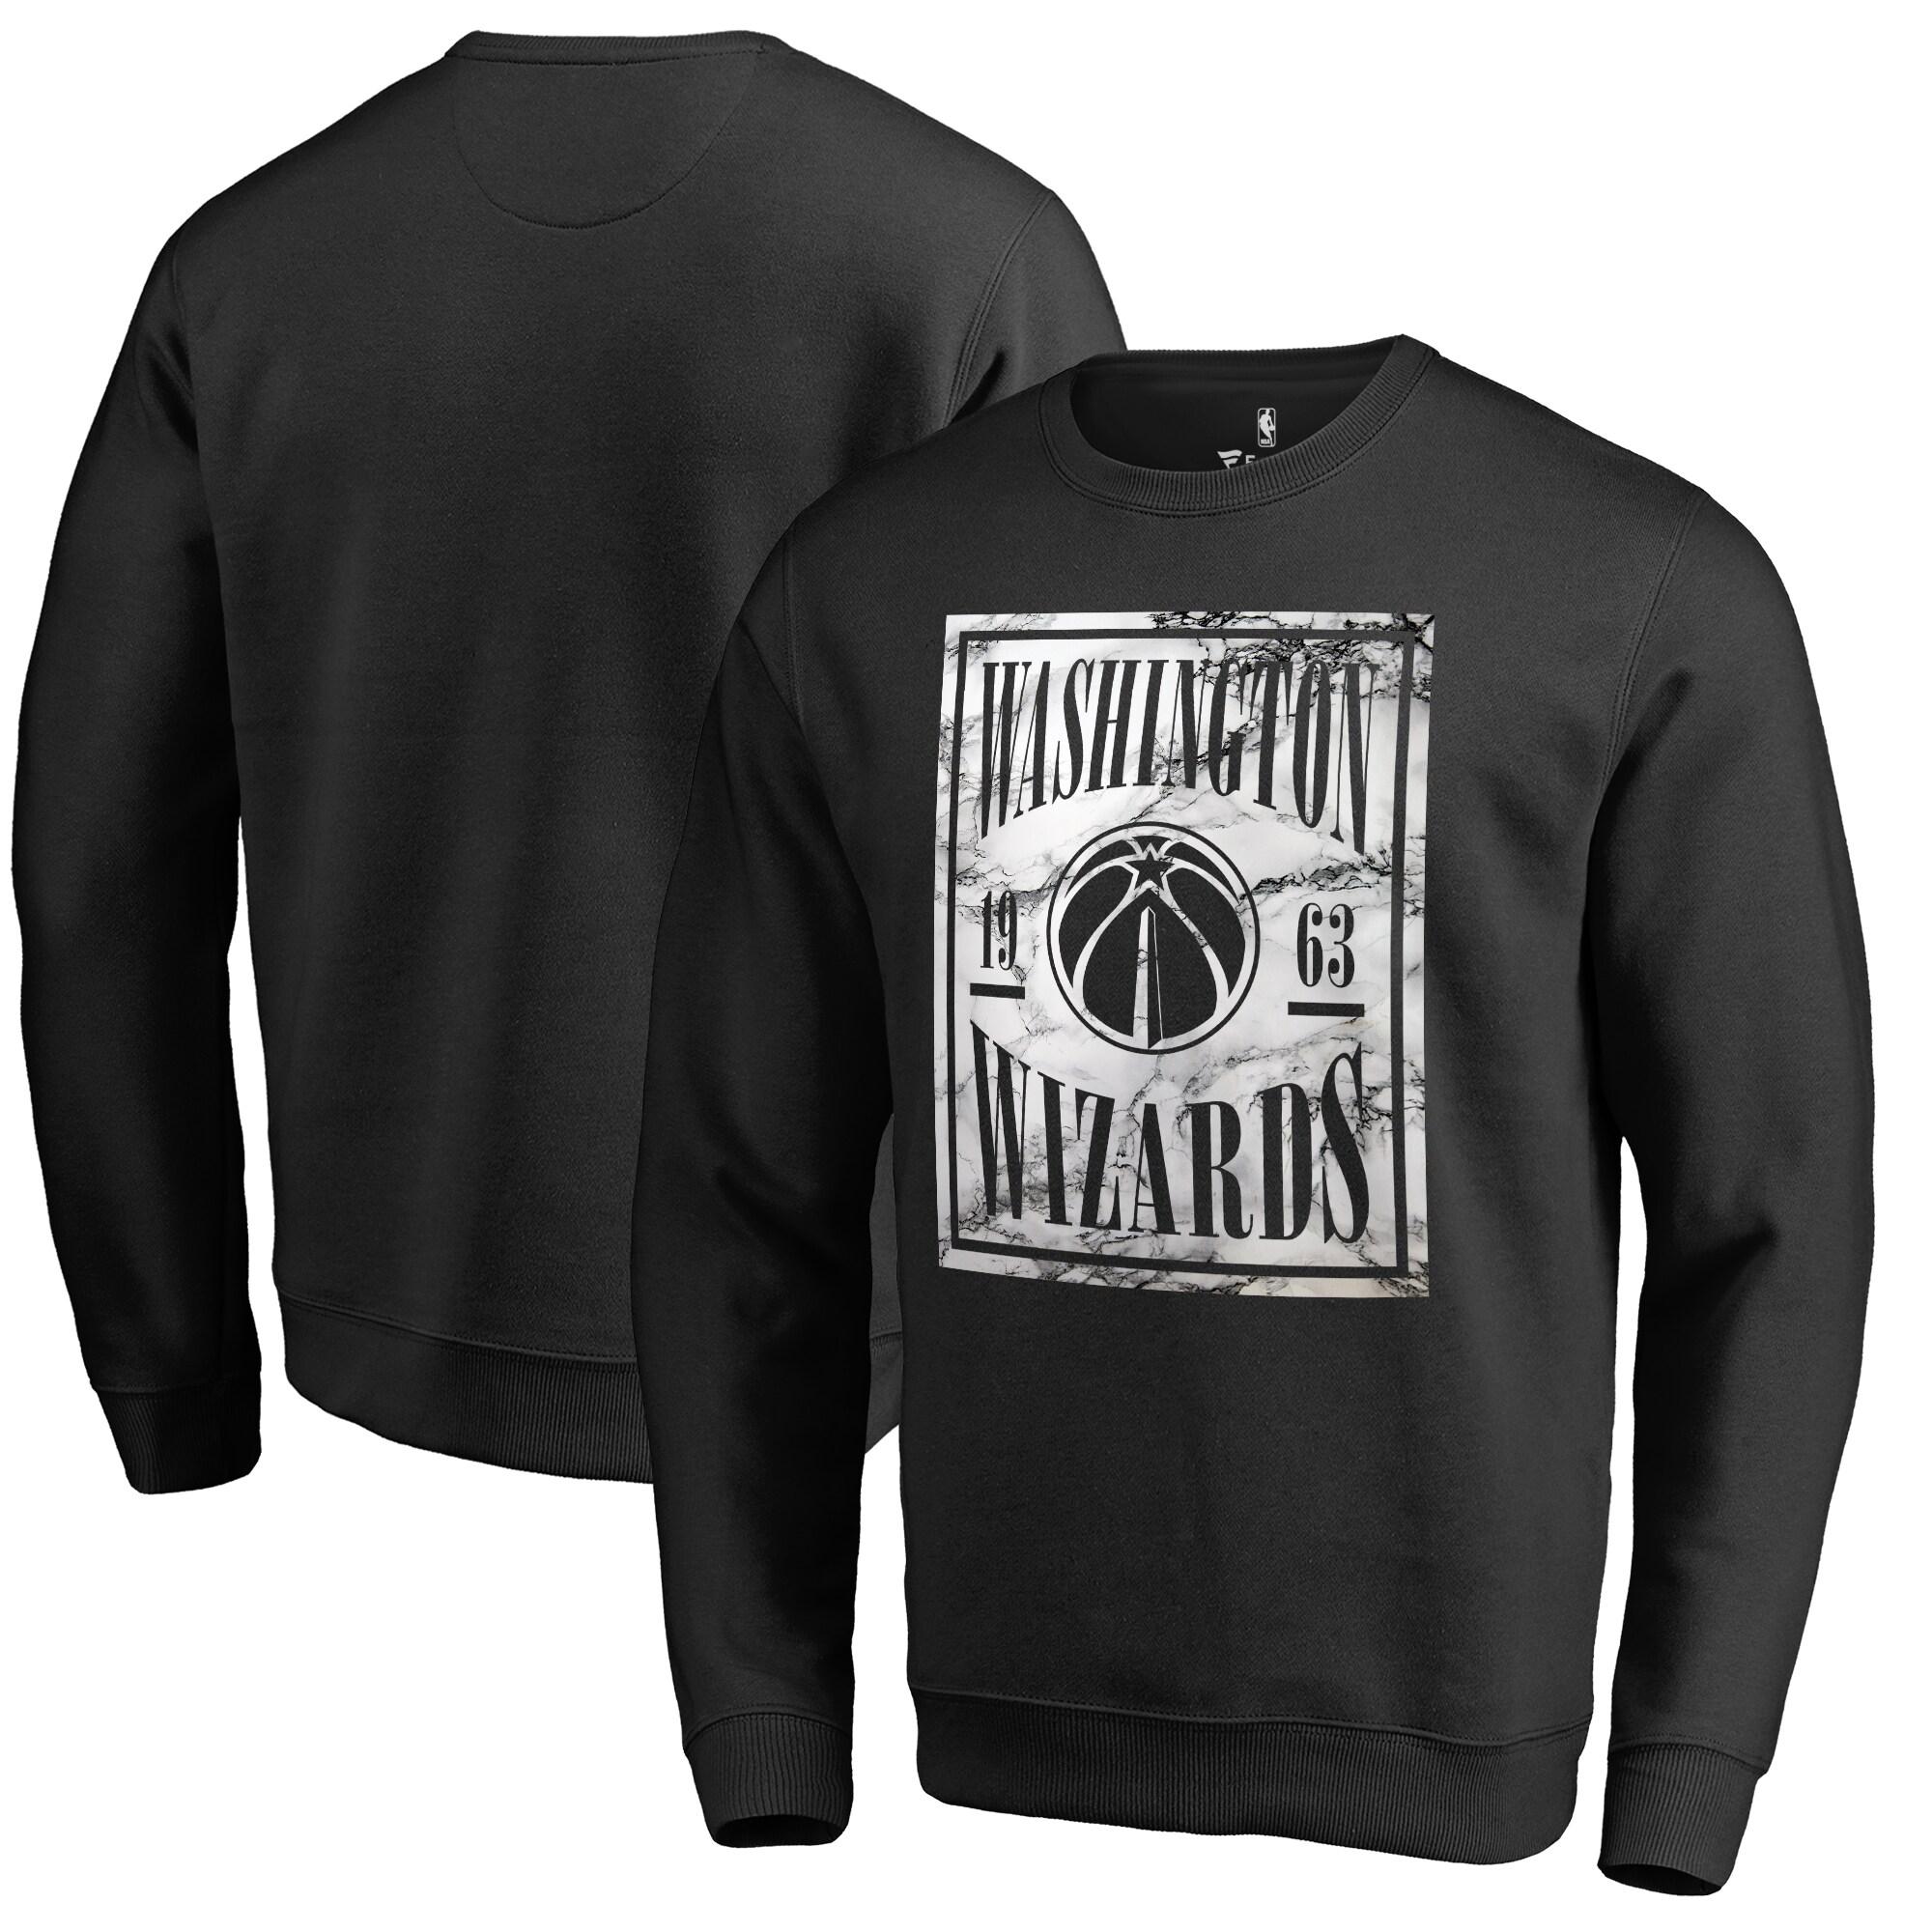 Washington Wizards Fanatics Branded Court Vision Crew Sweatshirt - Black